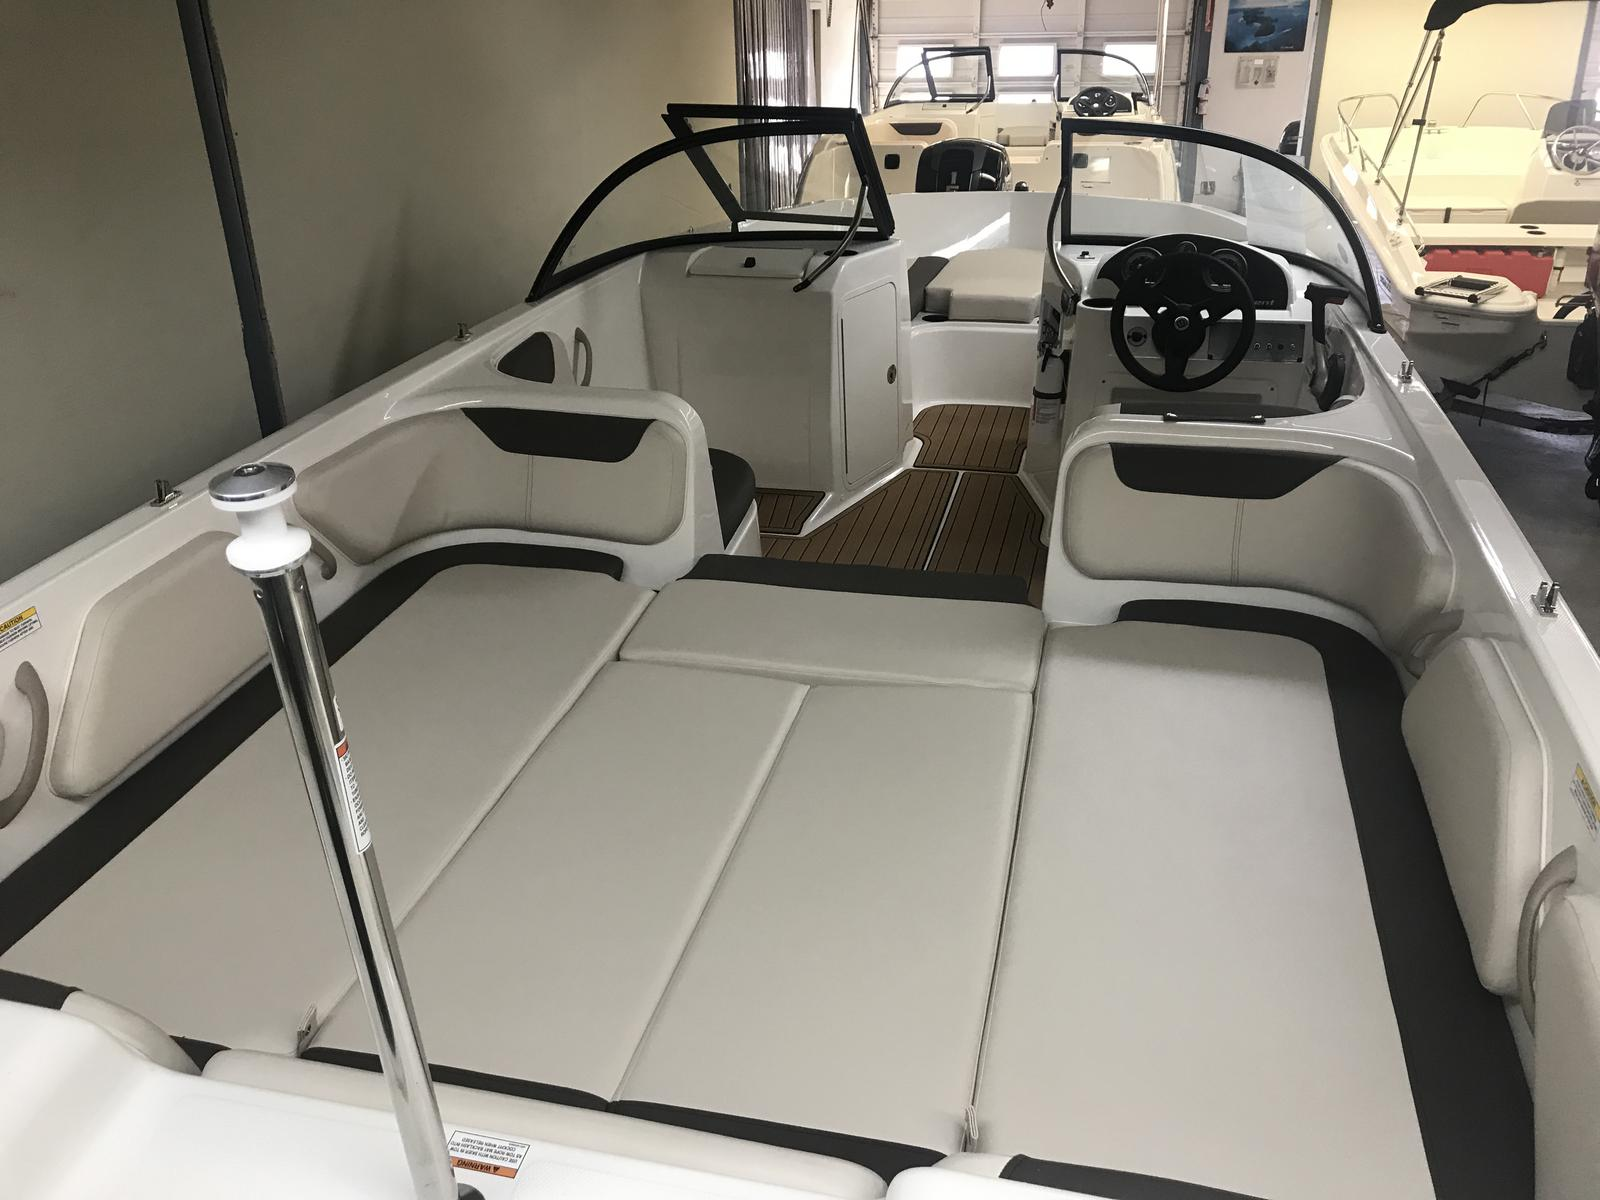 2019 Bayliner boat for sale, model of the boat is Element E21 & Image # 3 of 22